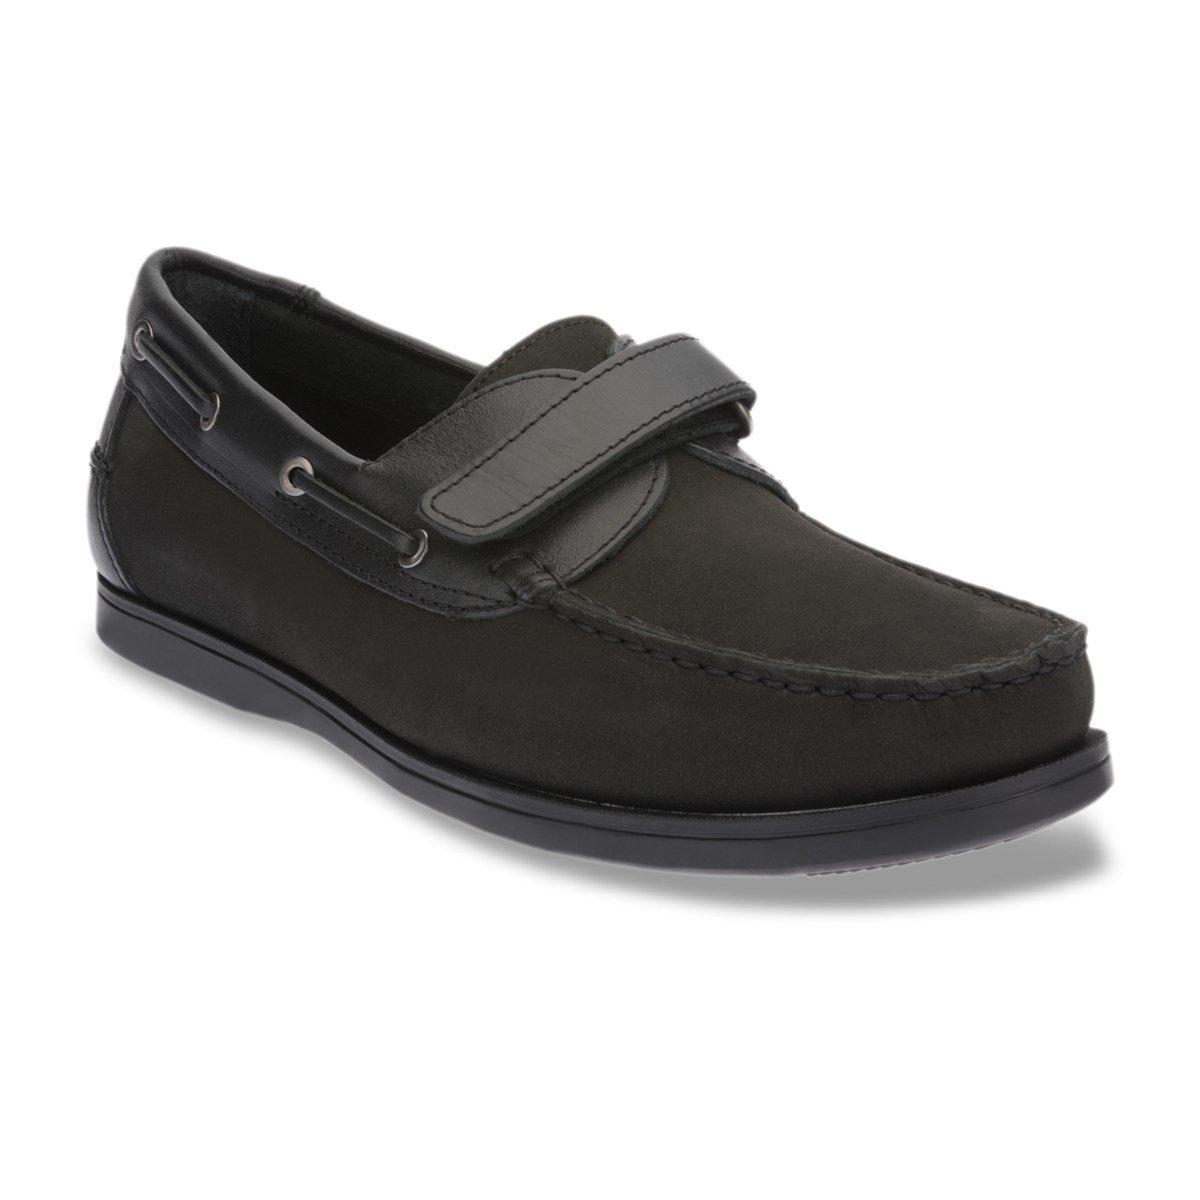 Scottwilliams Amati Premium Herren Bootsschuhe  P41|Beige